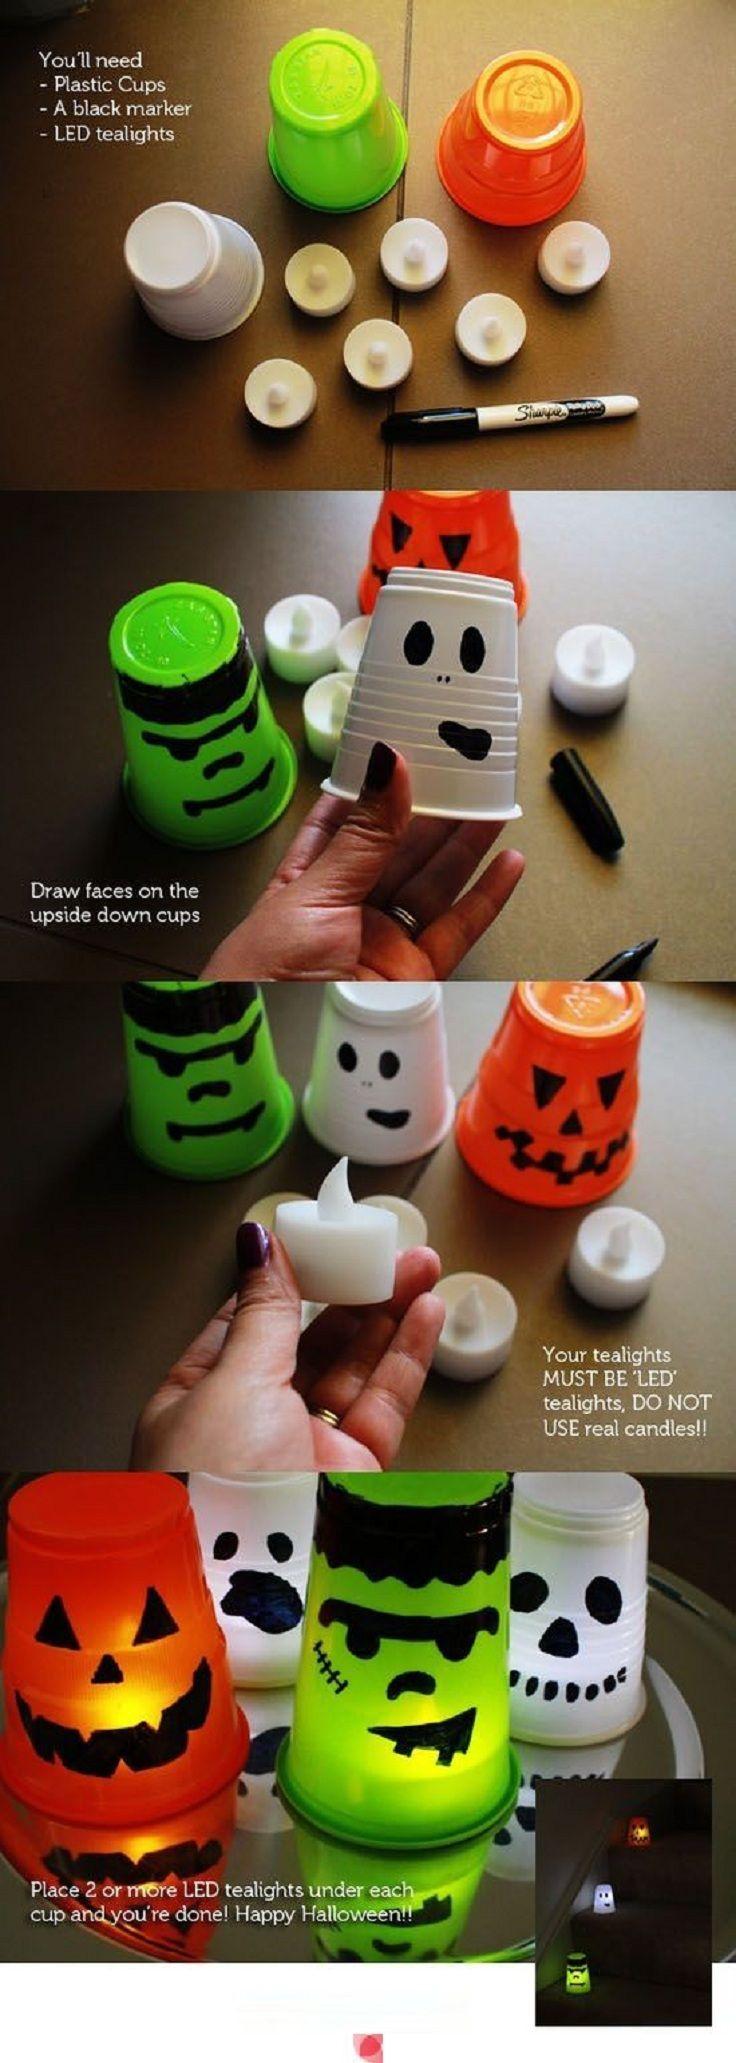 45 best Holloween images on Pinterest Halloween stuff, Halloween - cool homemade halloween decorations